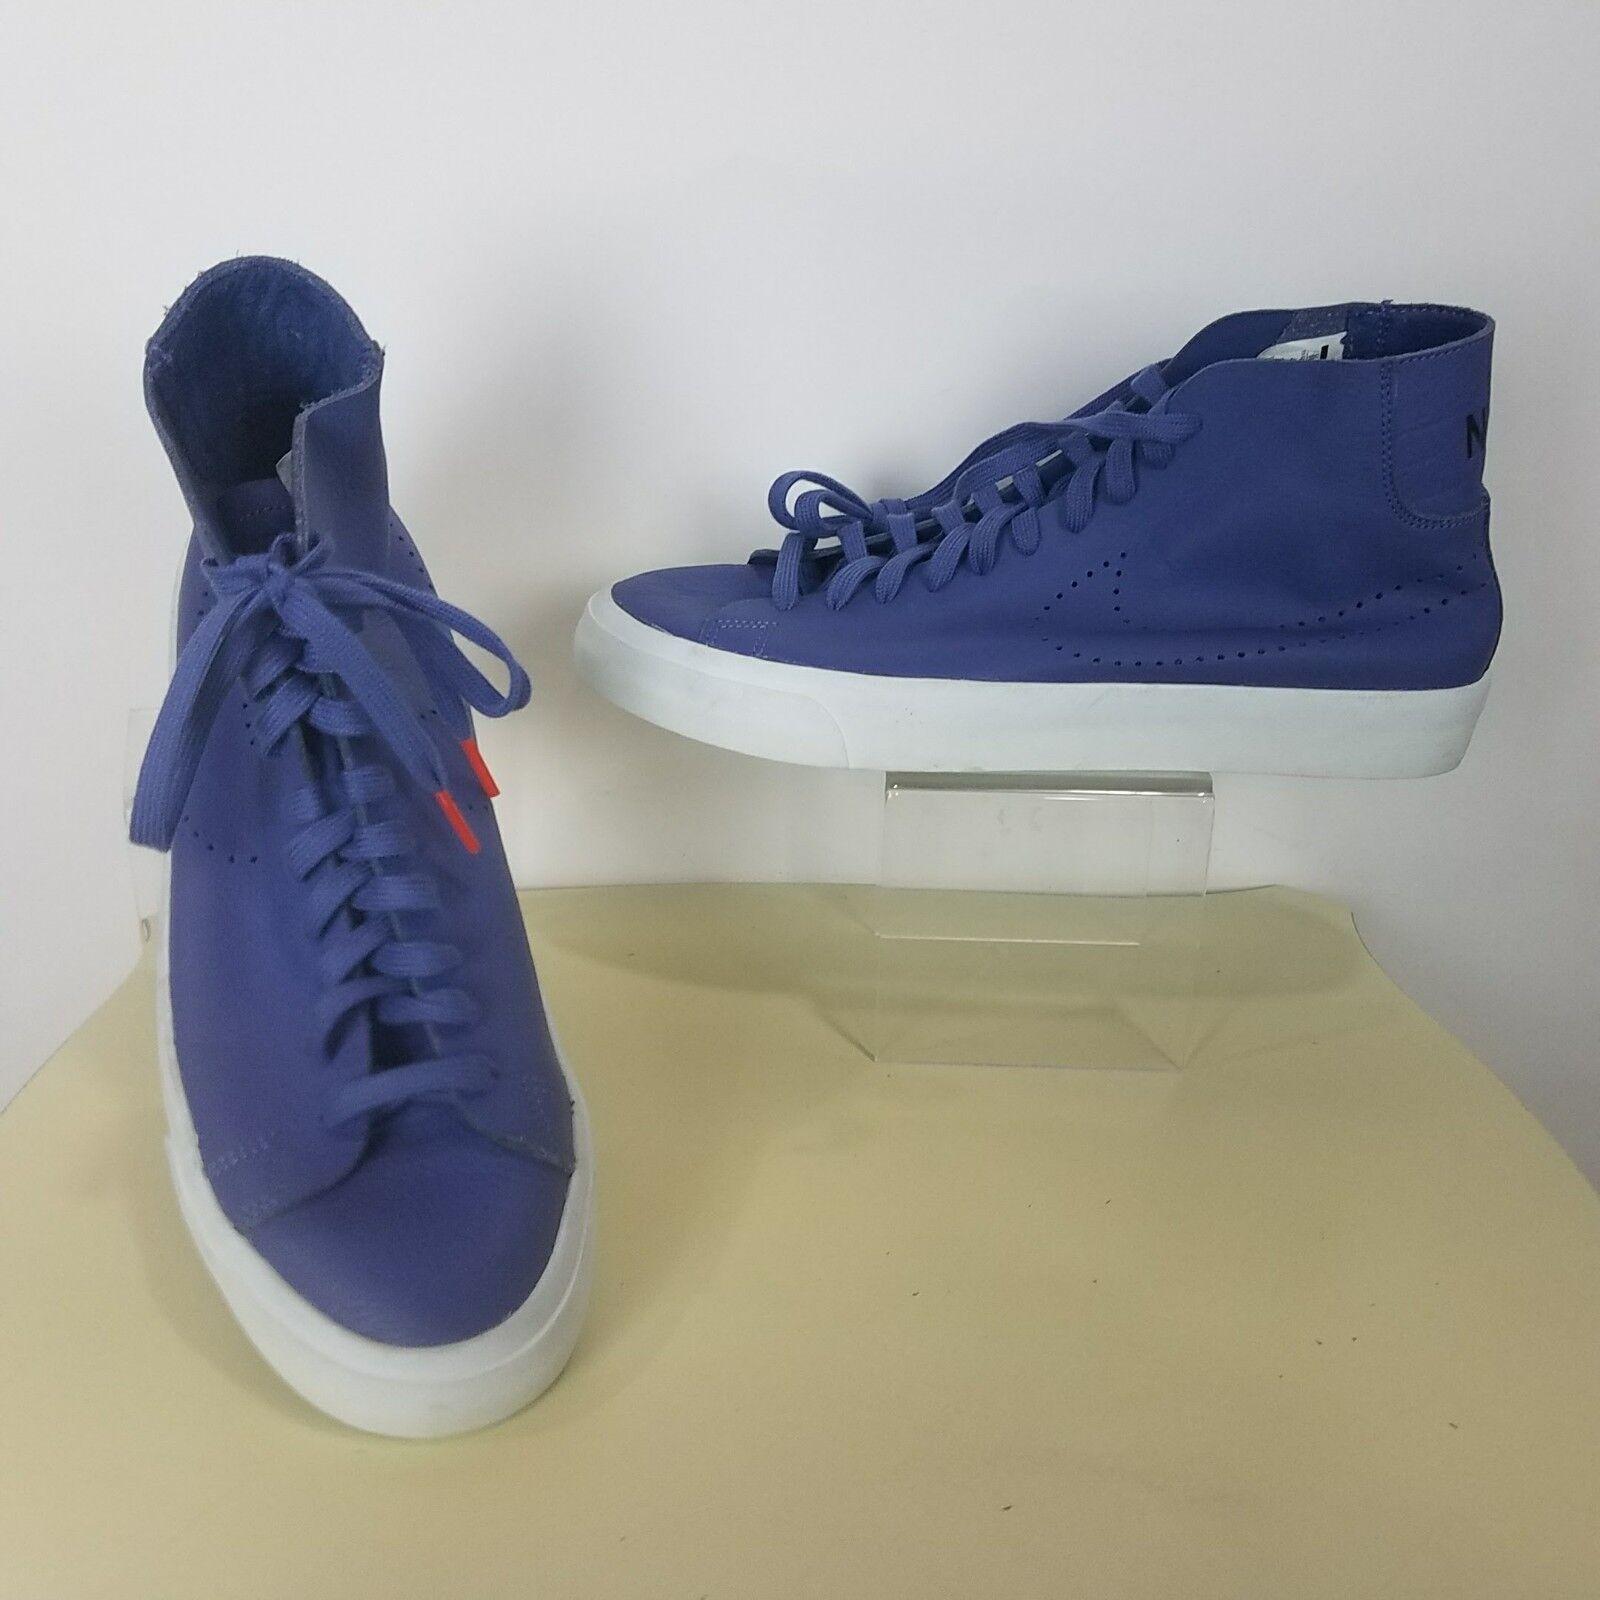 Nike Mens 11 Blazer Studio Italian Leather Blue Moon 880870-400 Skater Hi-Top